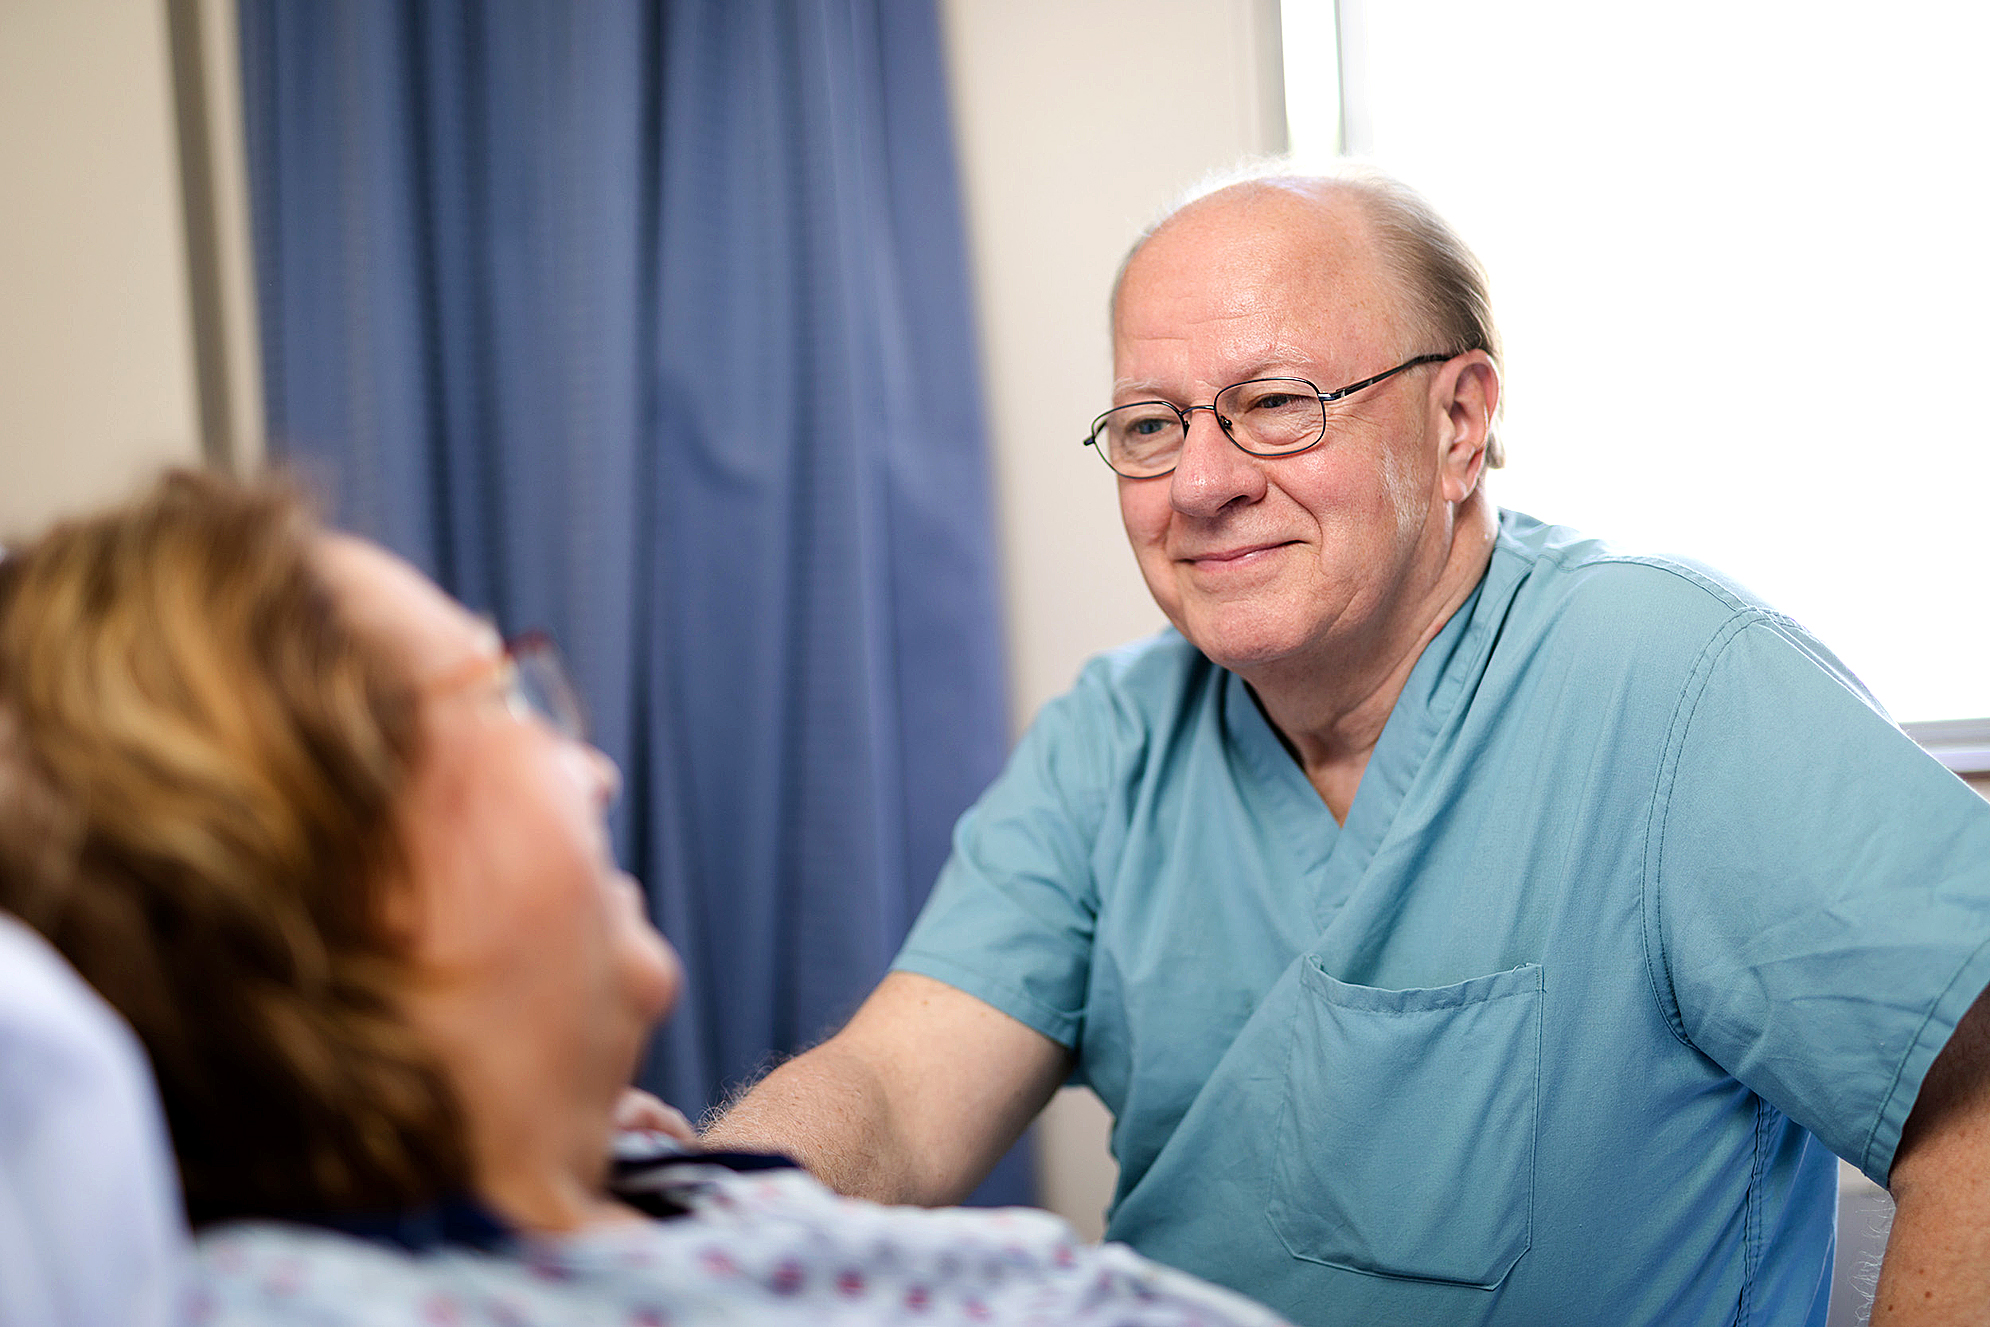 UPMC — Bringing life-changing medicine to Northcentral